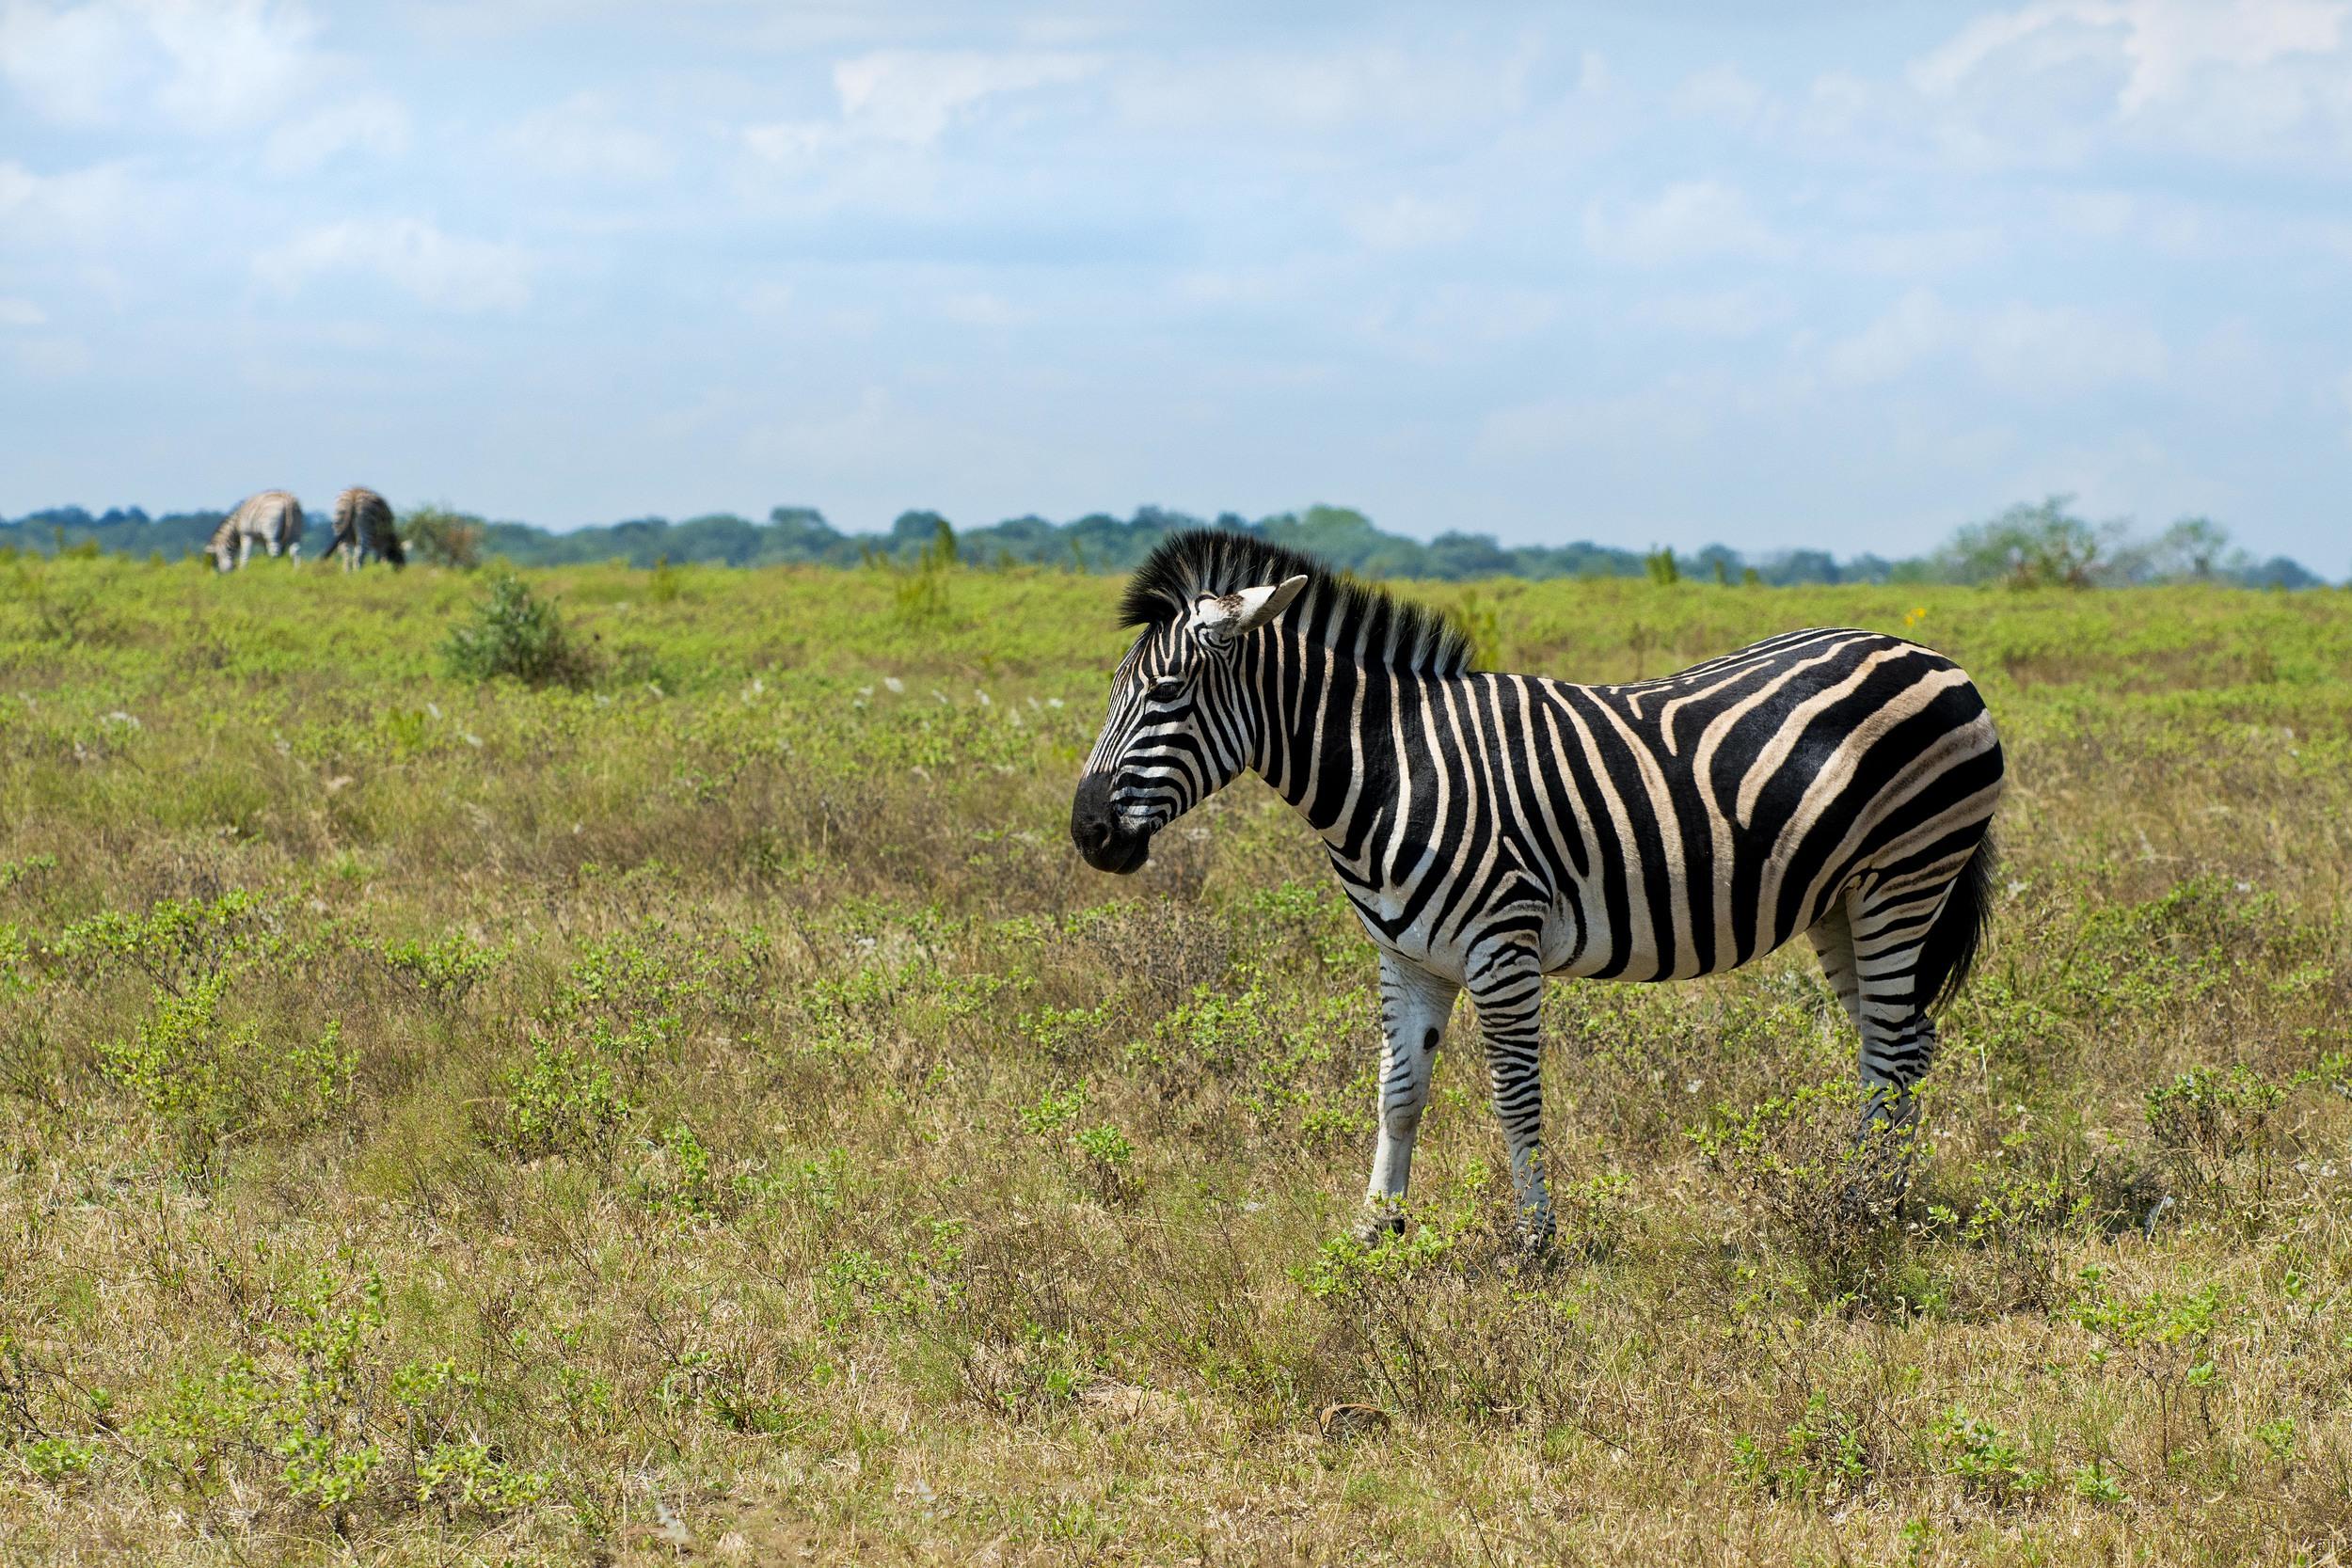 130420_DSC3771 Zebras Fore and Back.jpg